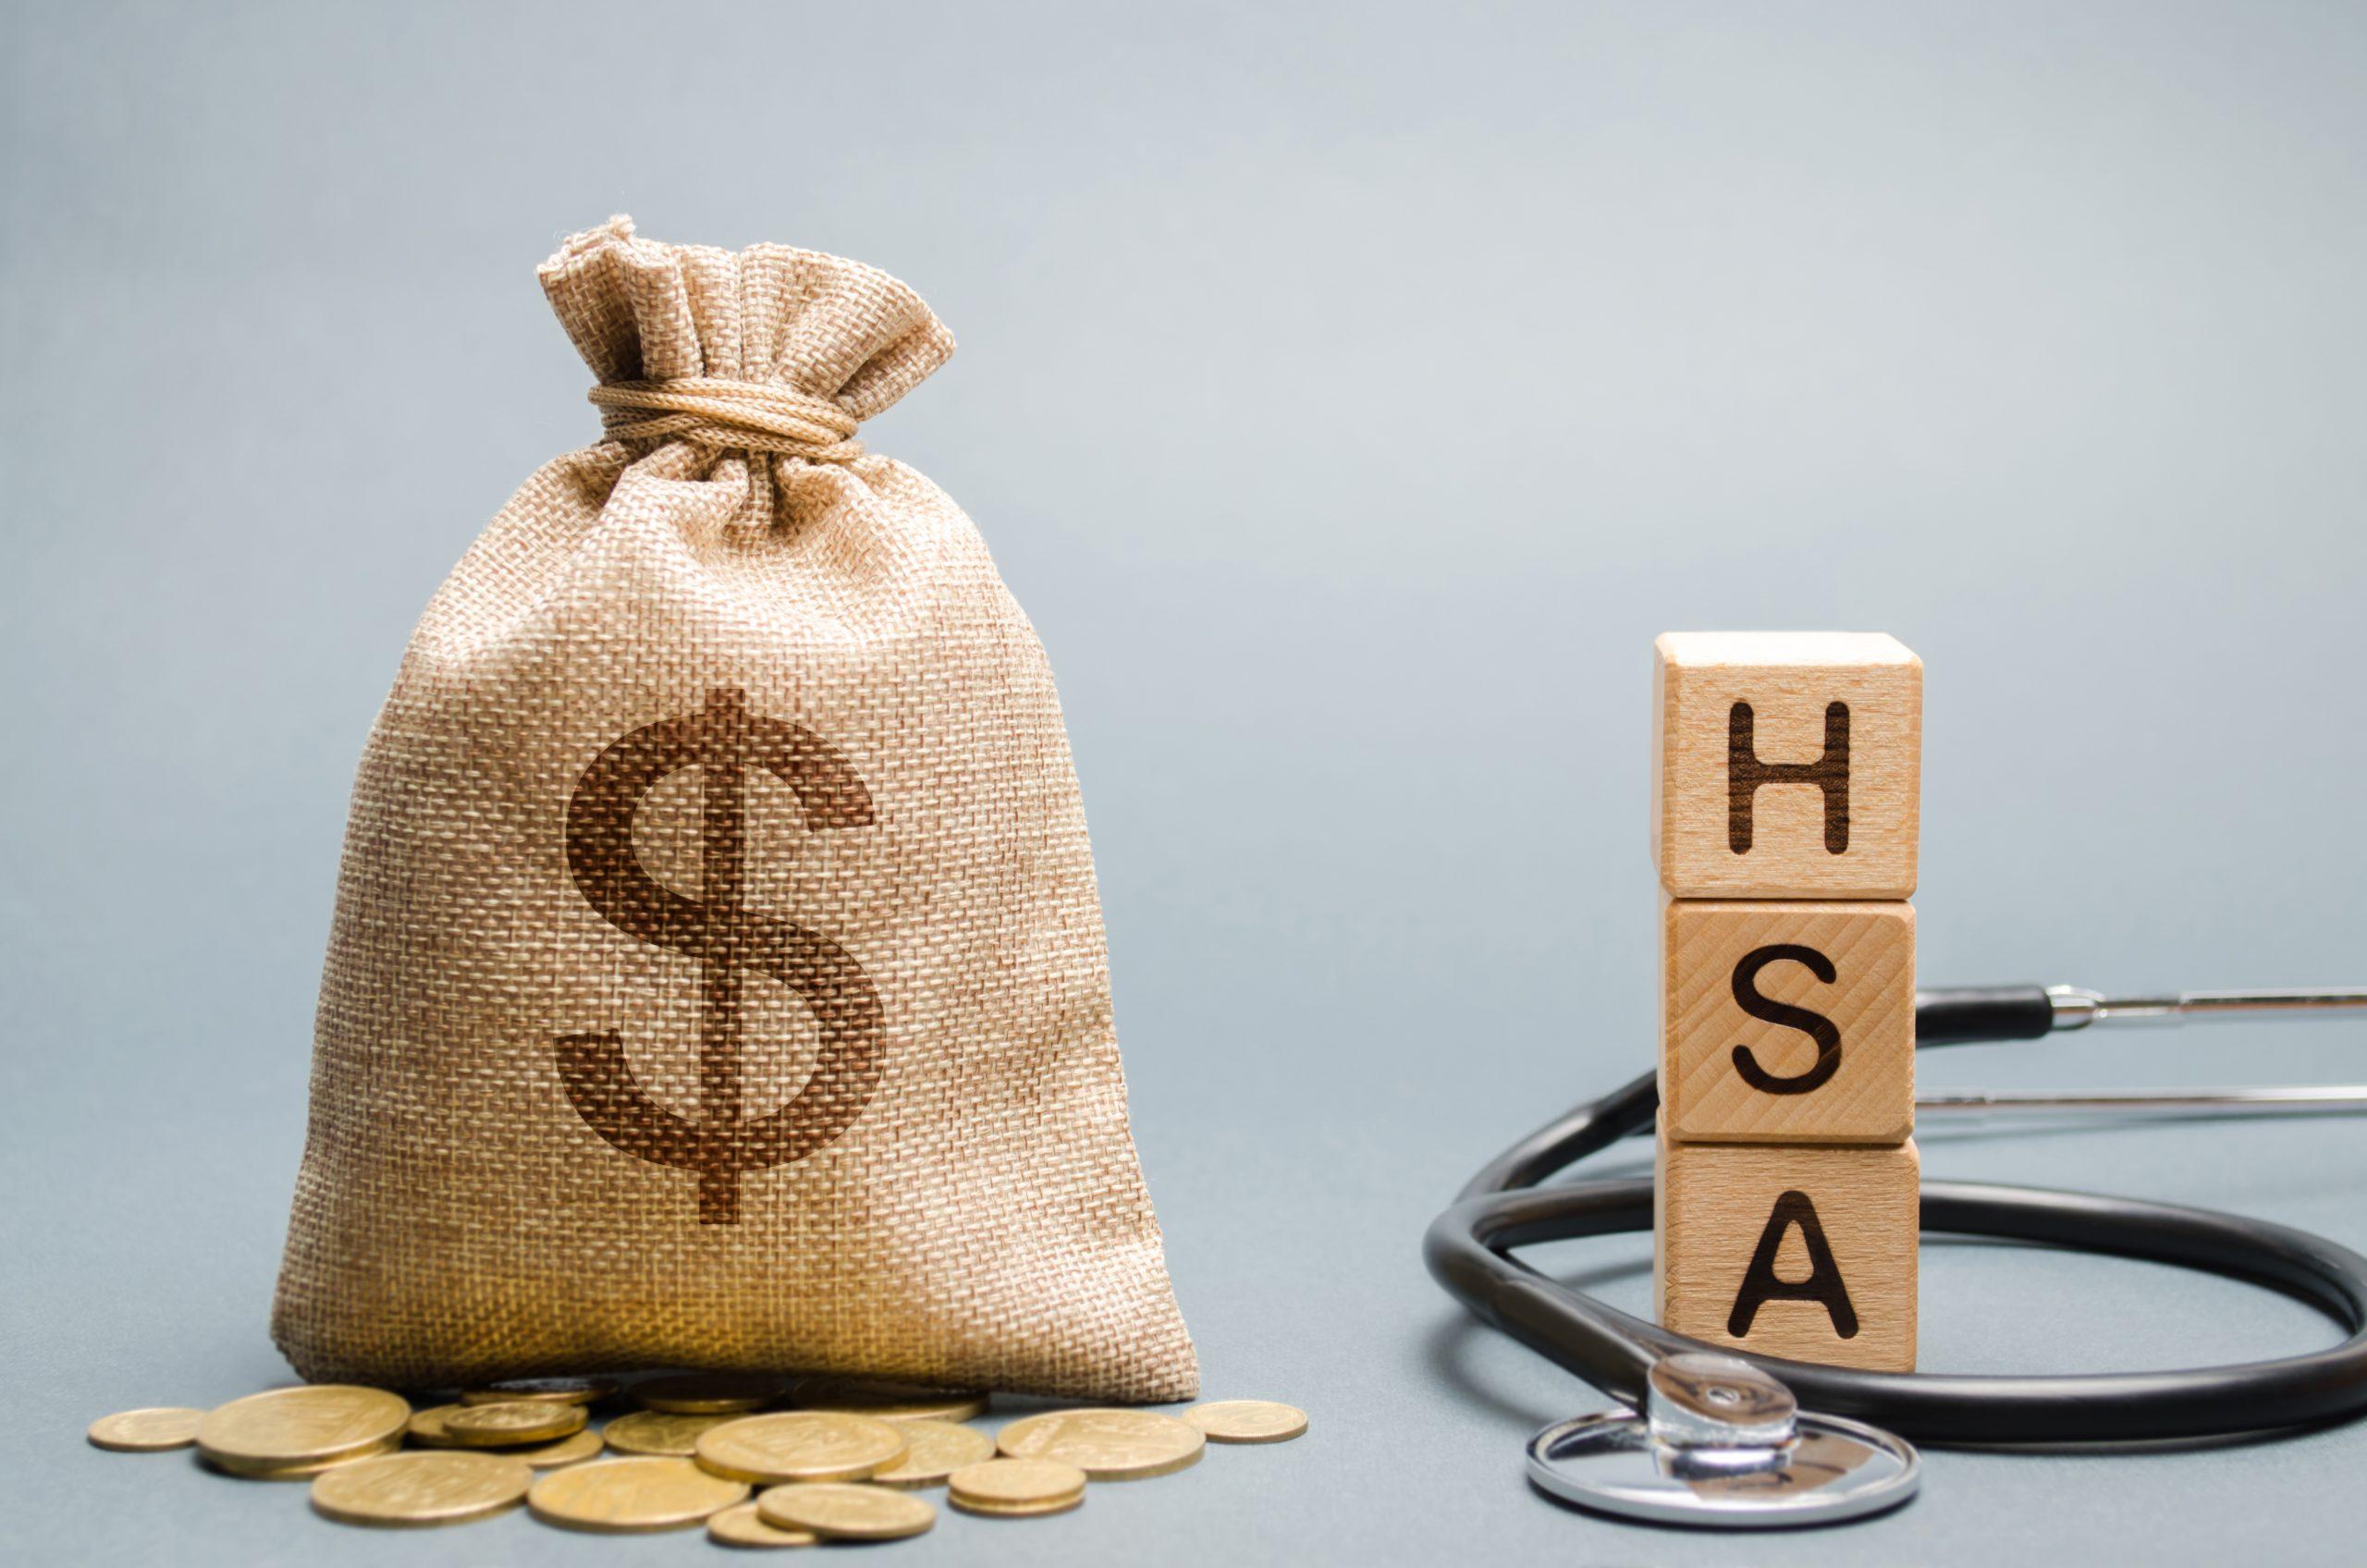 HSA account emergency medical fund IRA financial advisor WH Cornerstone south shore massachusetts